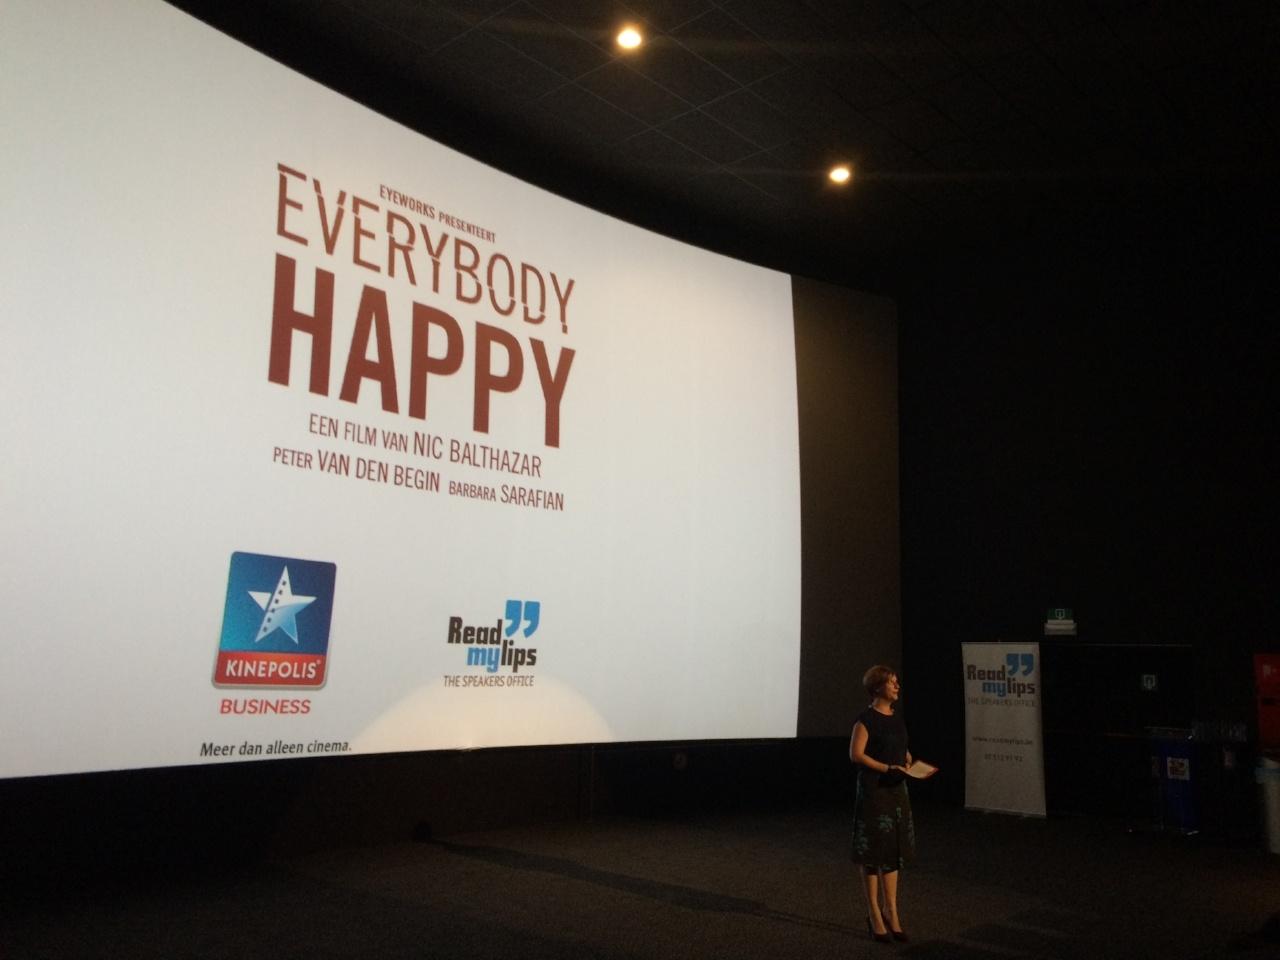 Event_EverybodyHappy_filmzaal.jpg